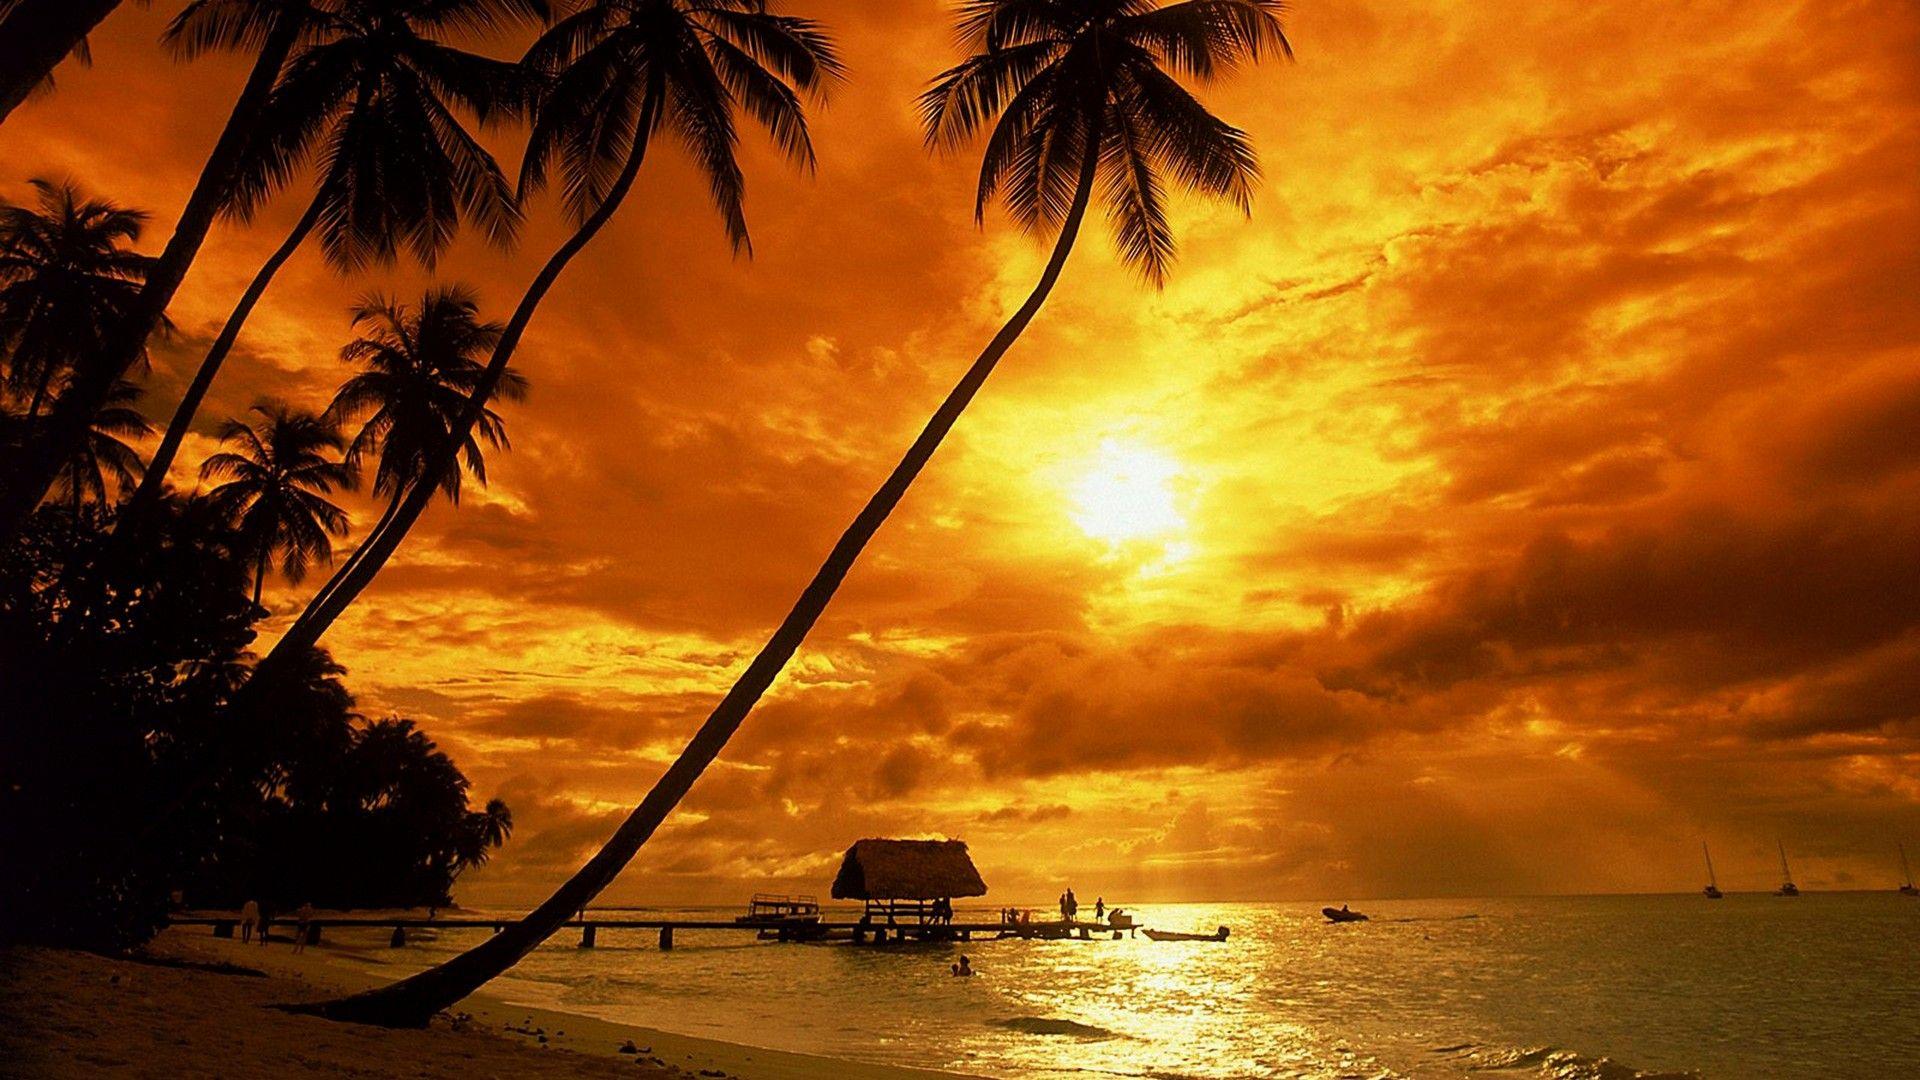 Wallpapers Computer Sunset 2021 Live Wallpaper Hd Sunset Wallpaper Beach Wallpaper Beach Palm Trees